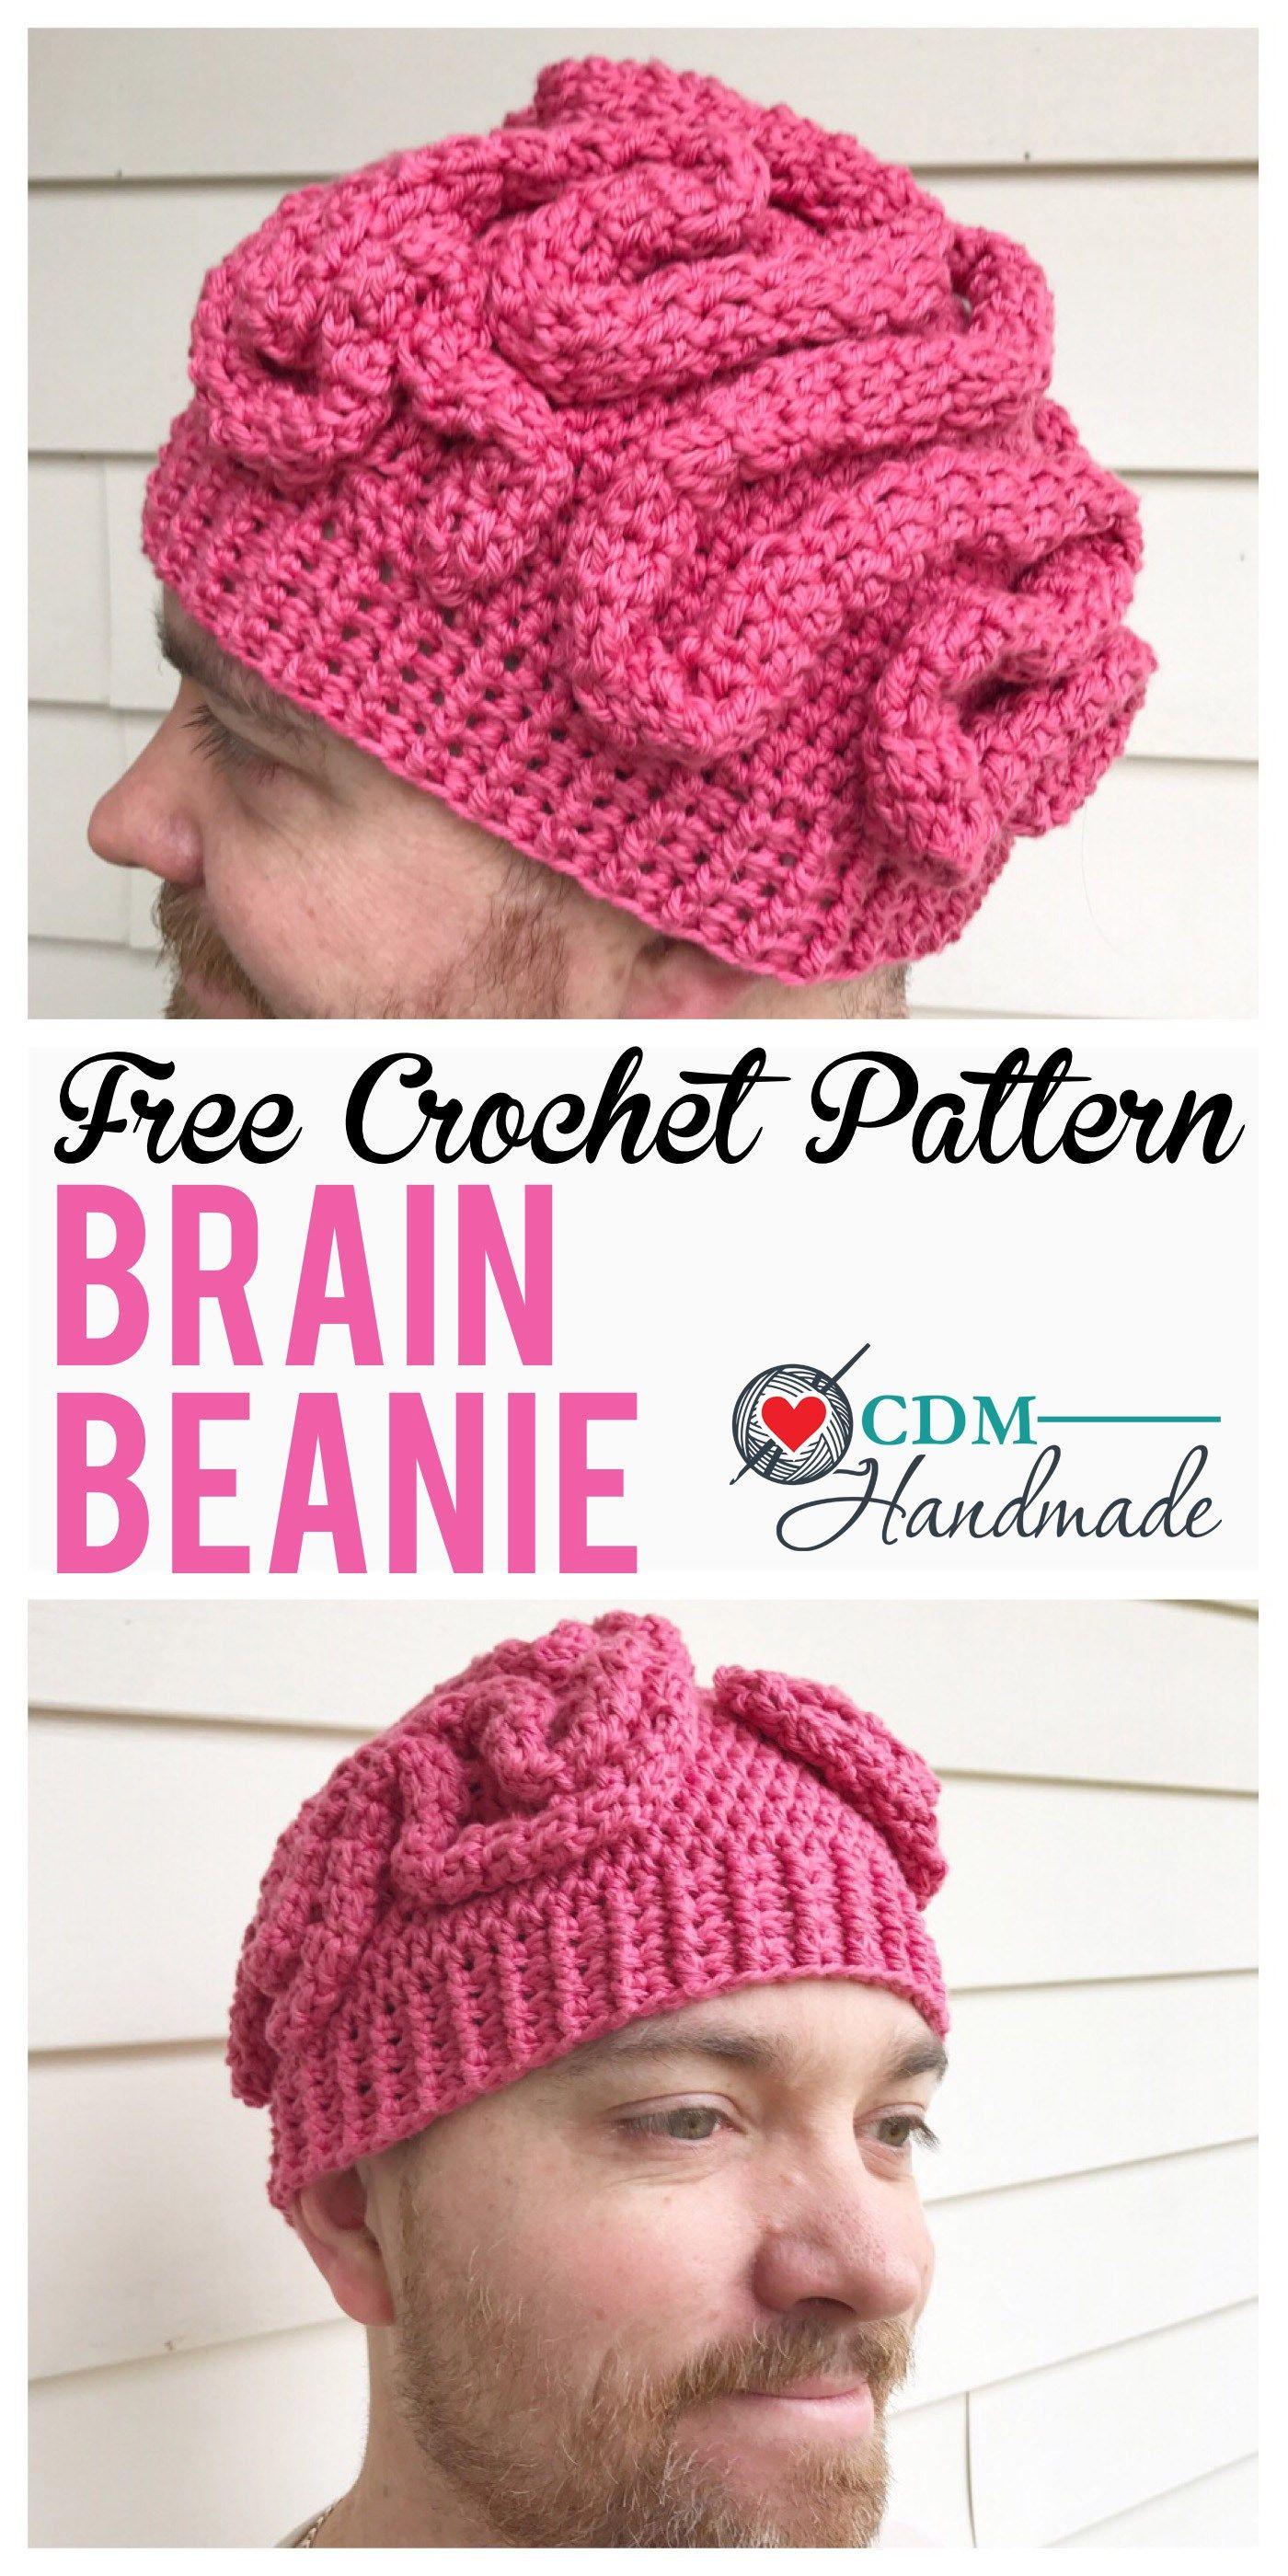 Crochet brain beanie | WHOot Best Crochet and Knitting Patterns ...